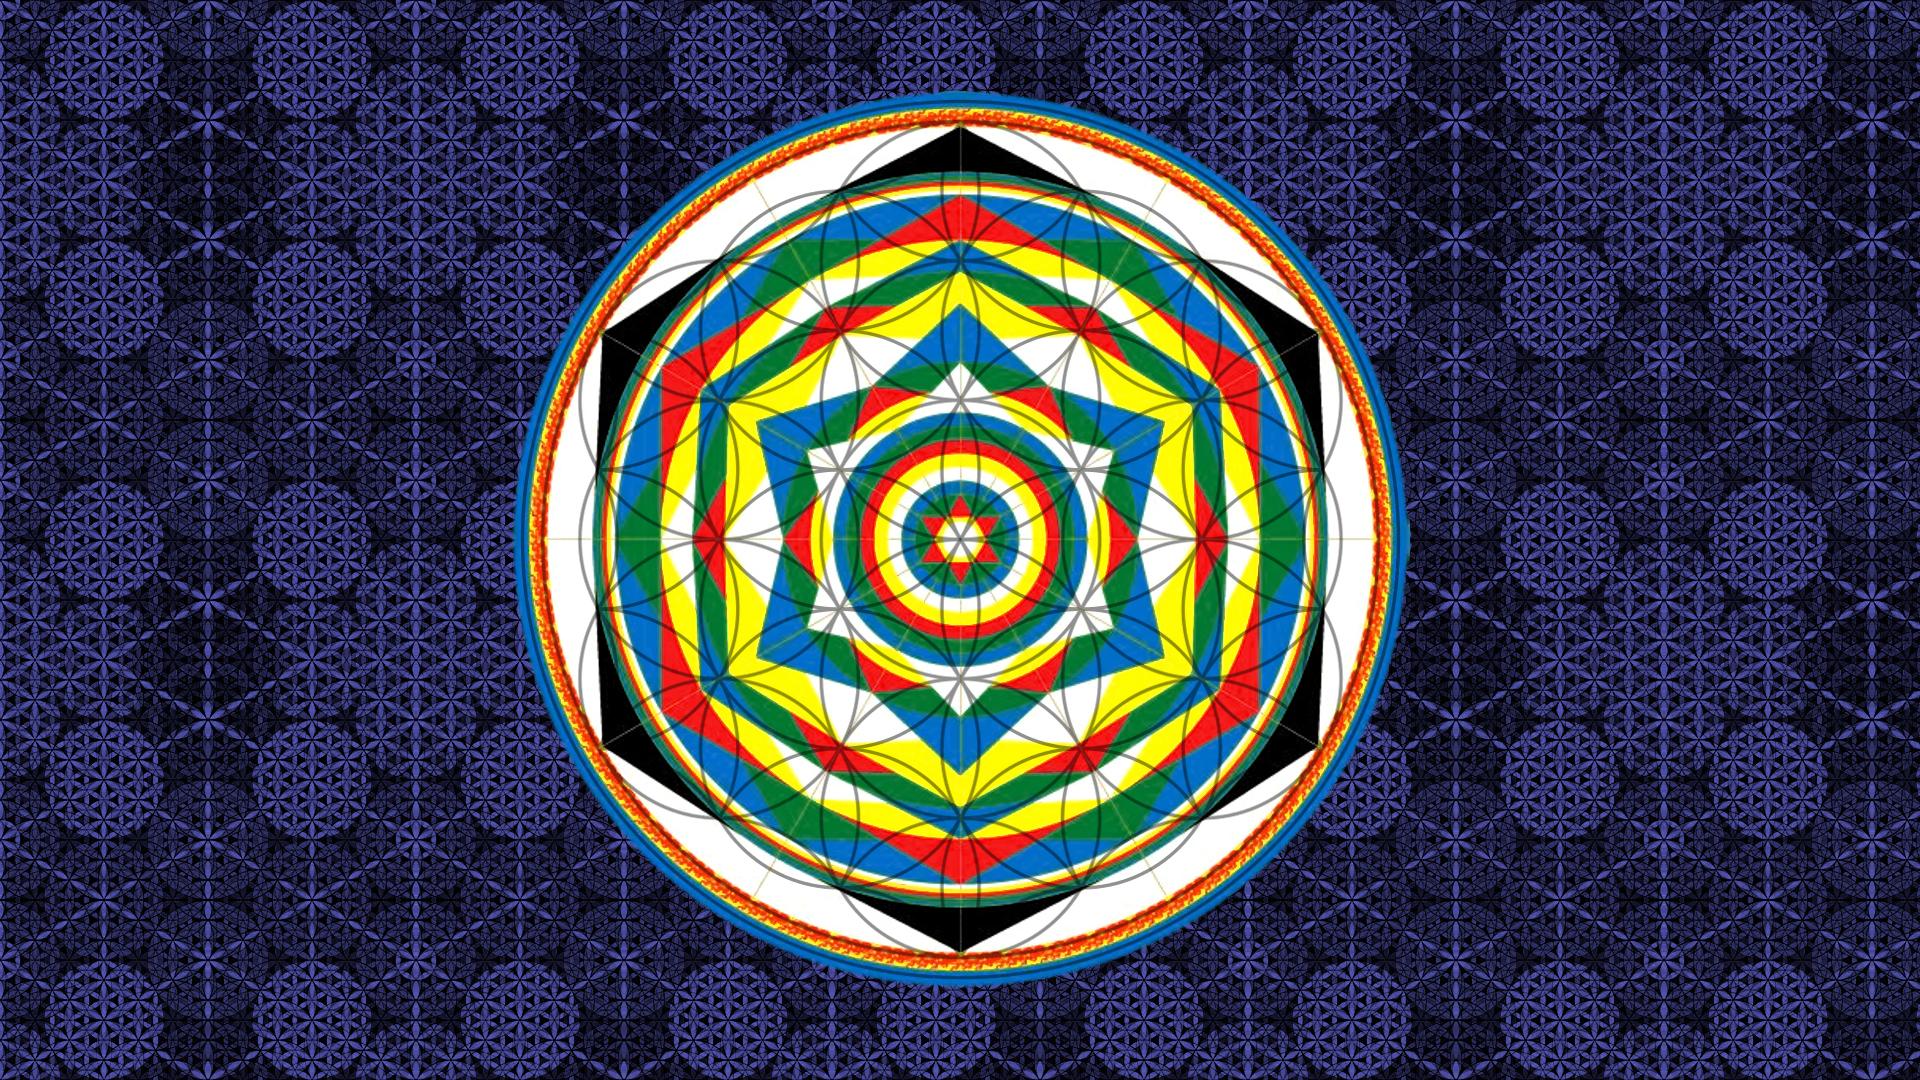 Free Download Life Flower Wallpaper Mandala Universal Symposion